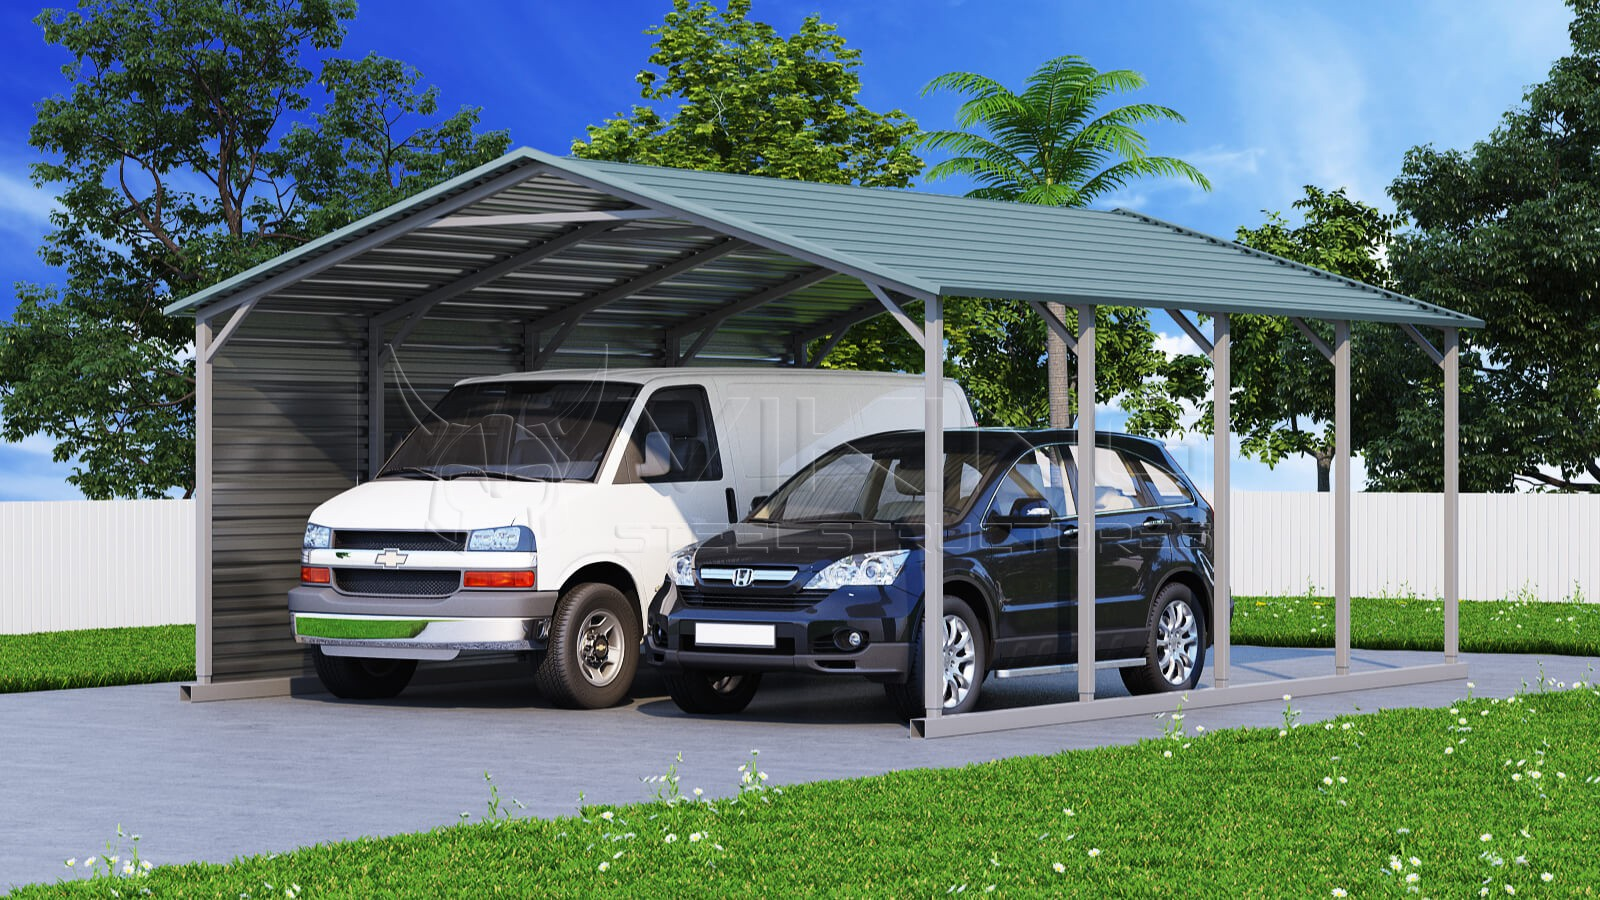 Metal Carport for Sale Near Me: How to Buy Carport